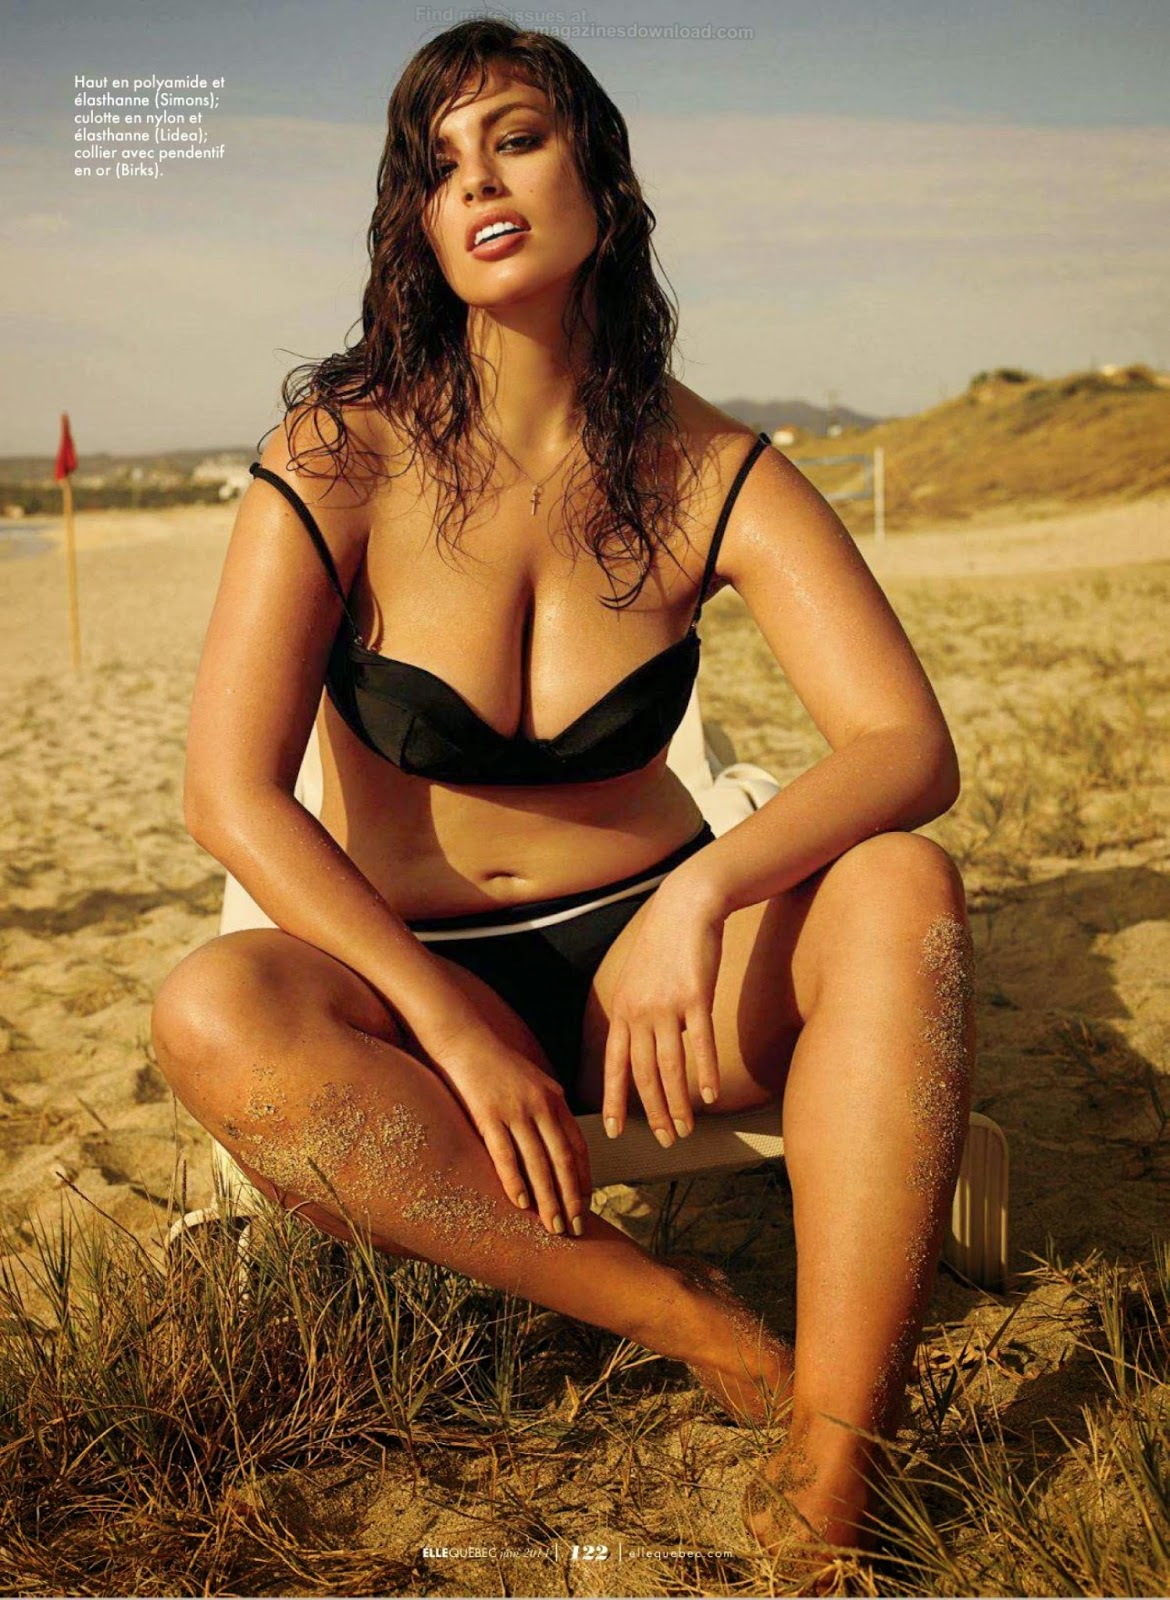 Bikini Jacinta Rokich nude (21 photos), Topless, Hot, Selfie, in bikini 2020